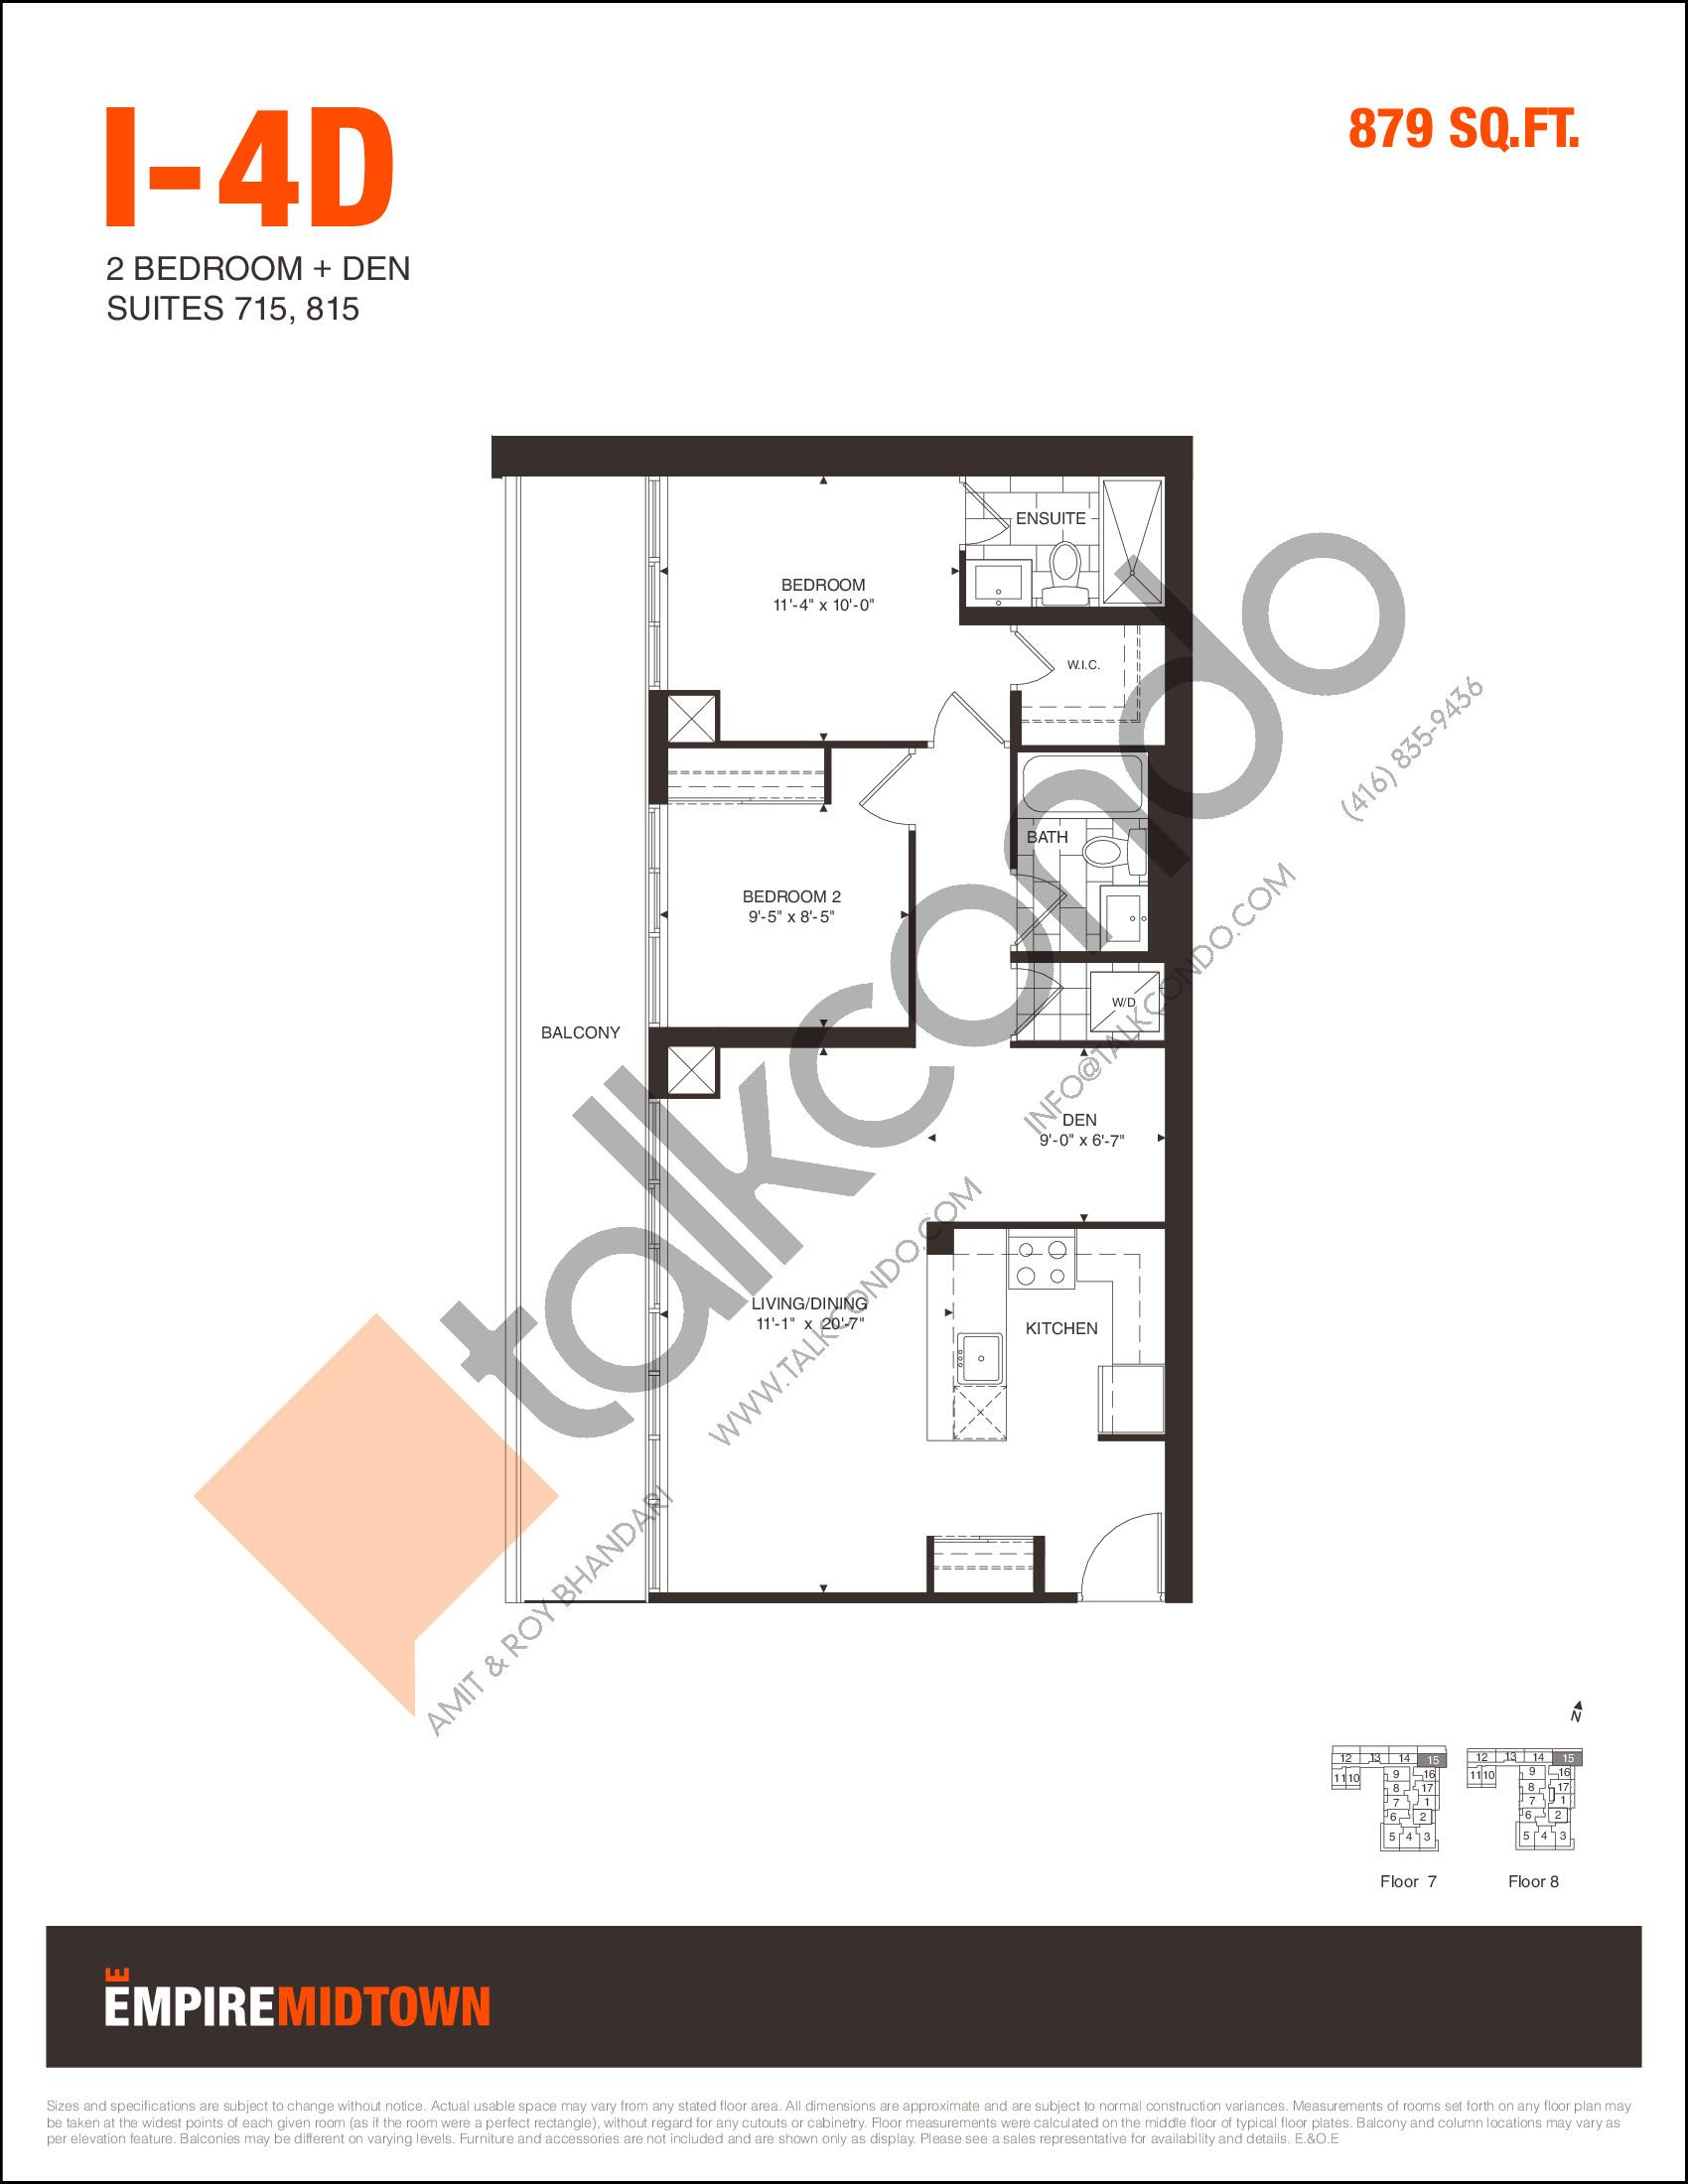 I-4D Floor Plan at Empire Midtown Condos - 879 sq.ft